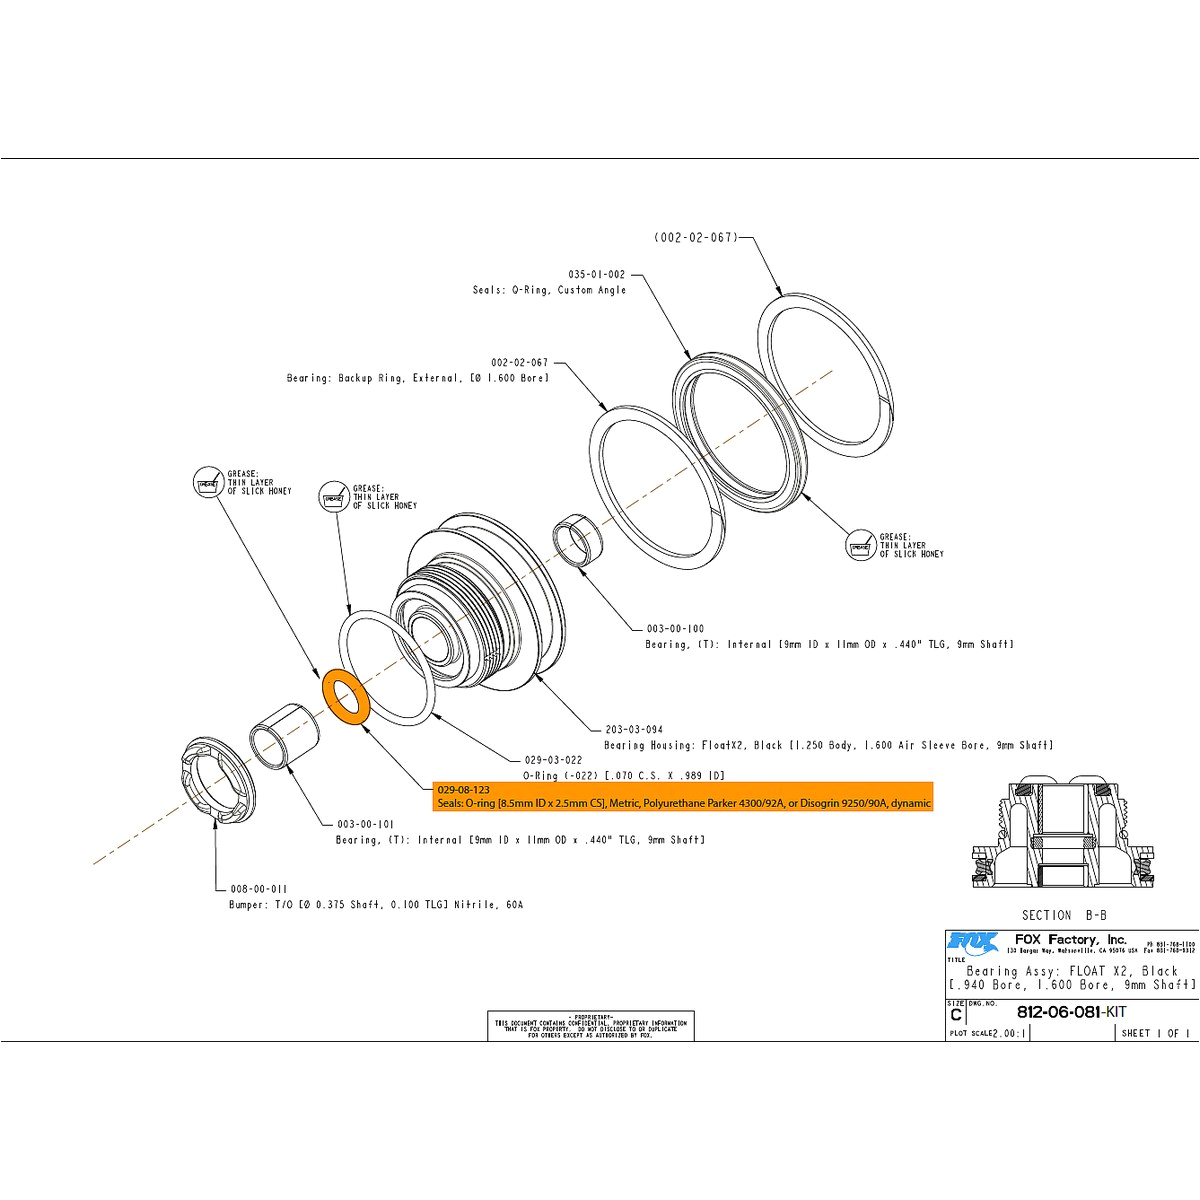 Leer Truck Cap Wiring Diagram Fox O Ring Dichtung 8 5mm Id X 2 5mm Cs Metric Fur Float X2 Dampfer 029 08 123